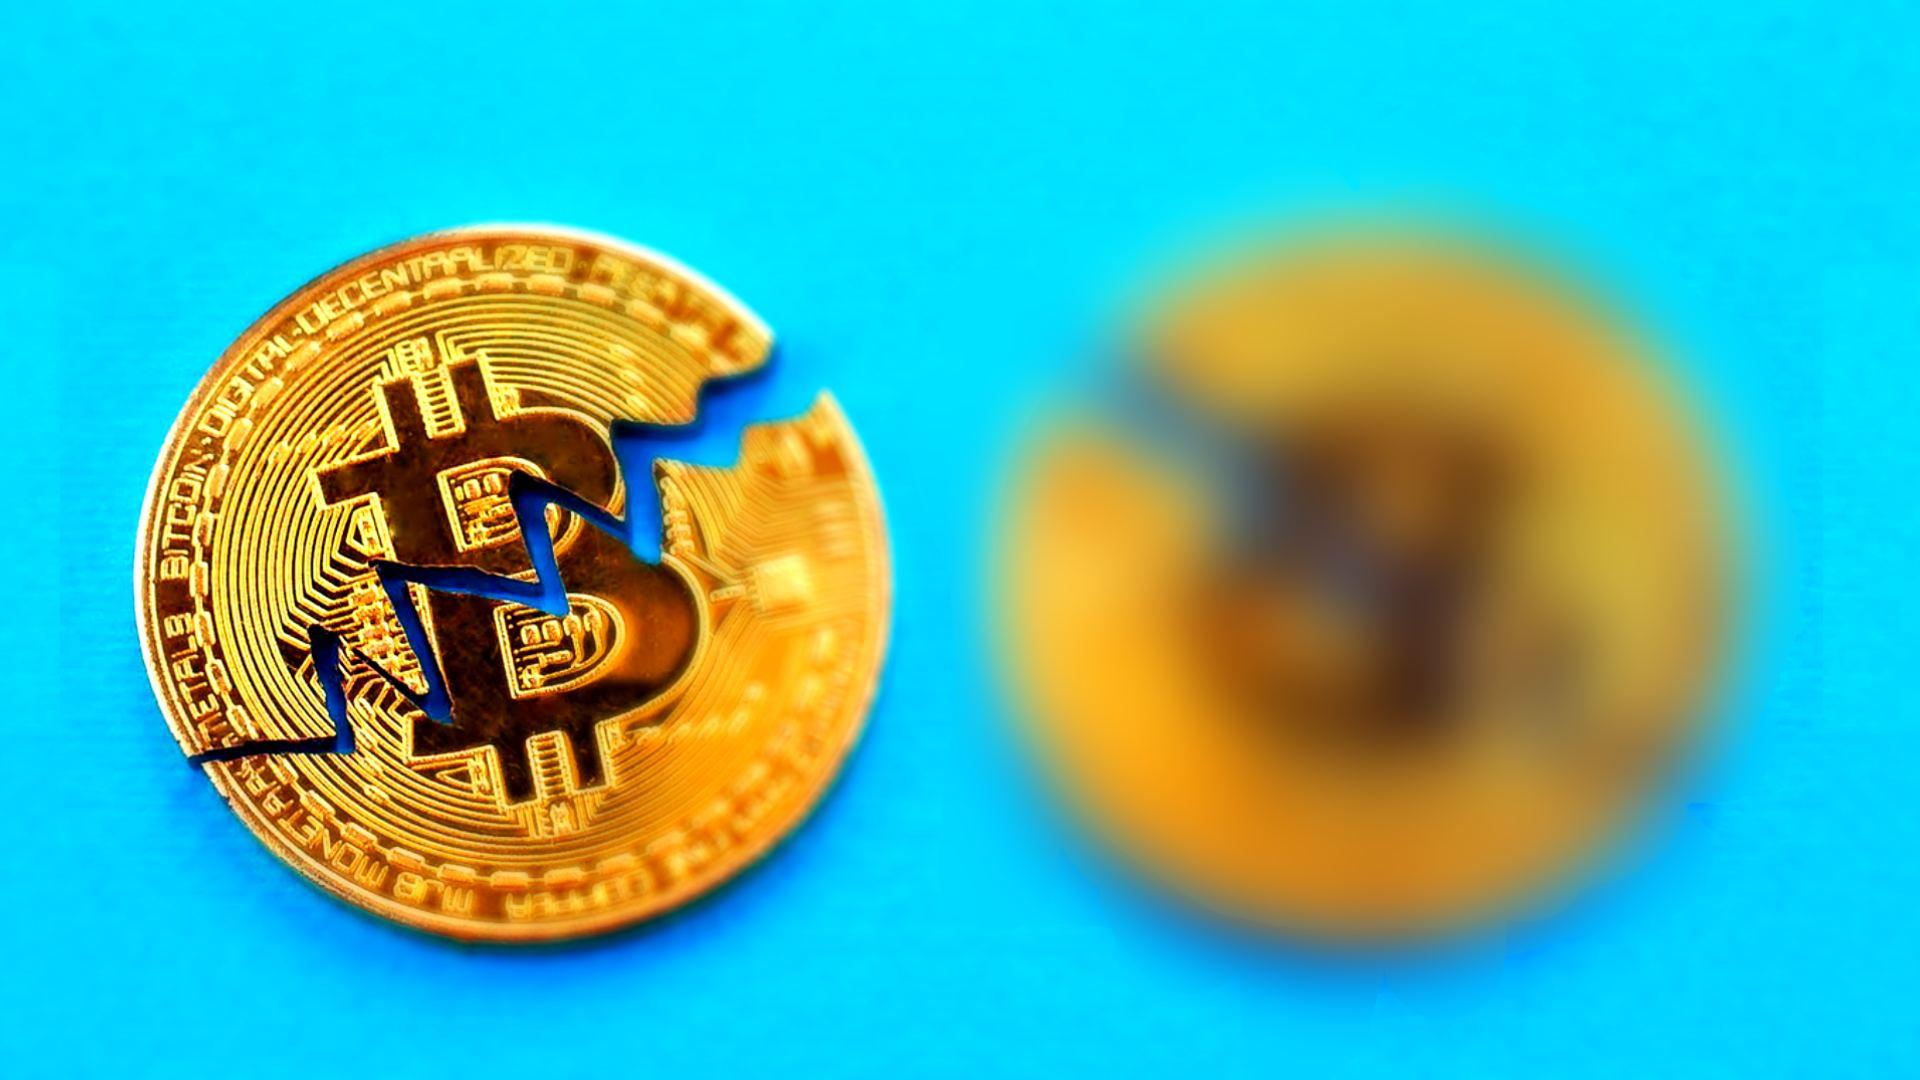 digitalis valuta europa libra